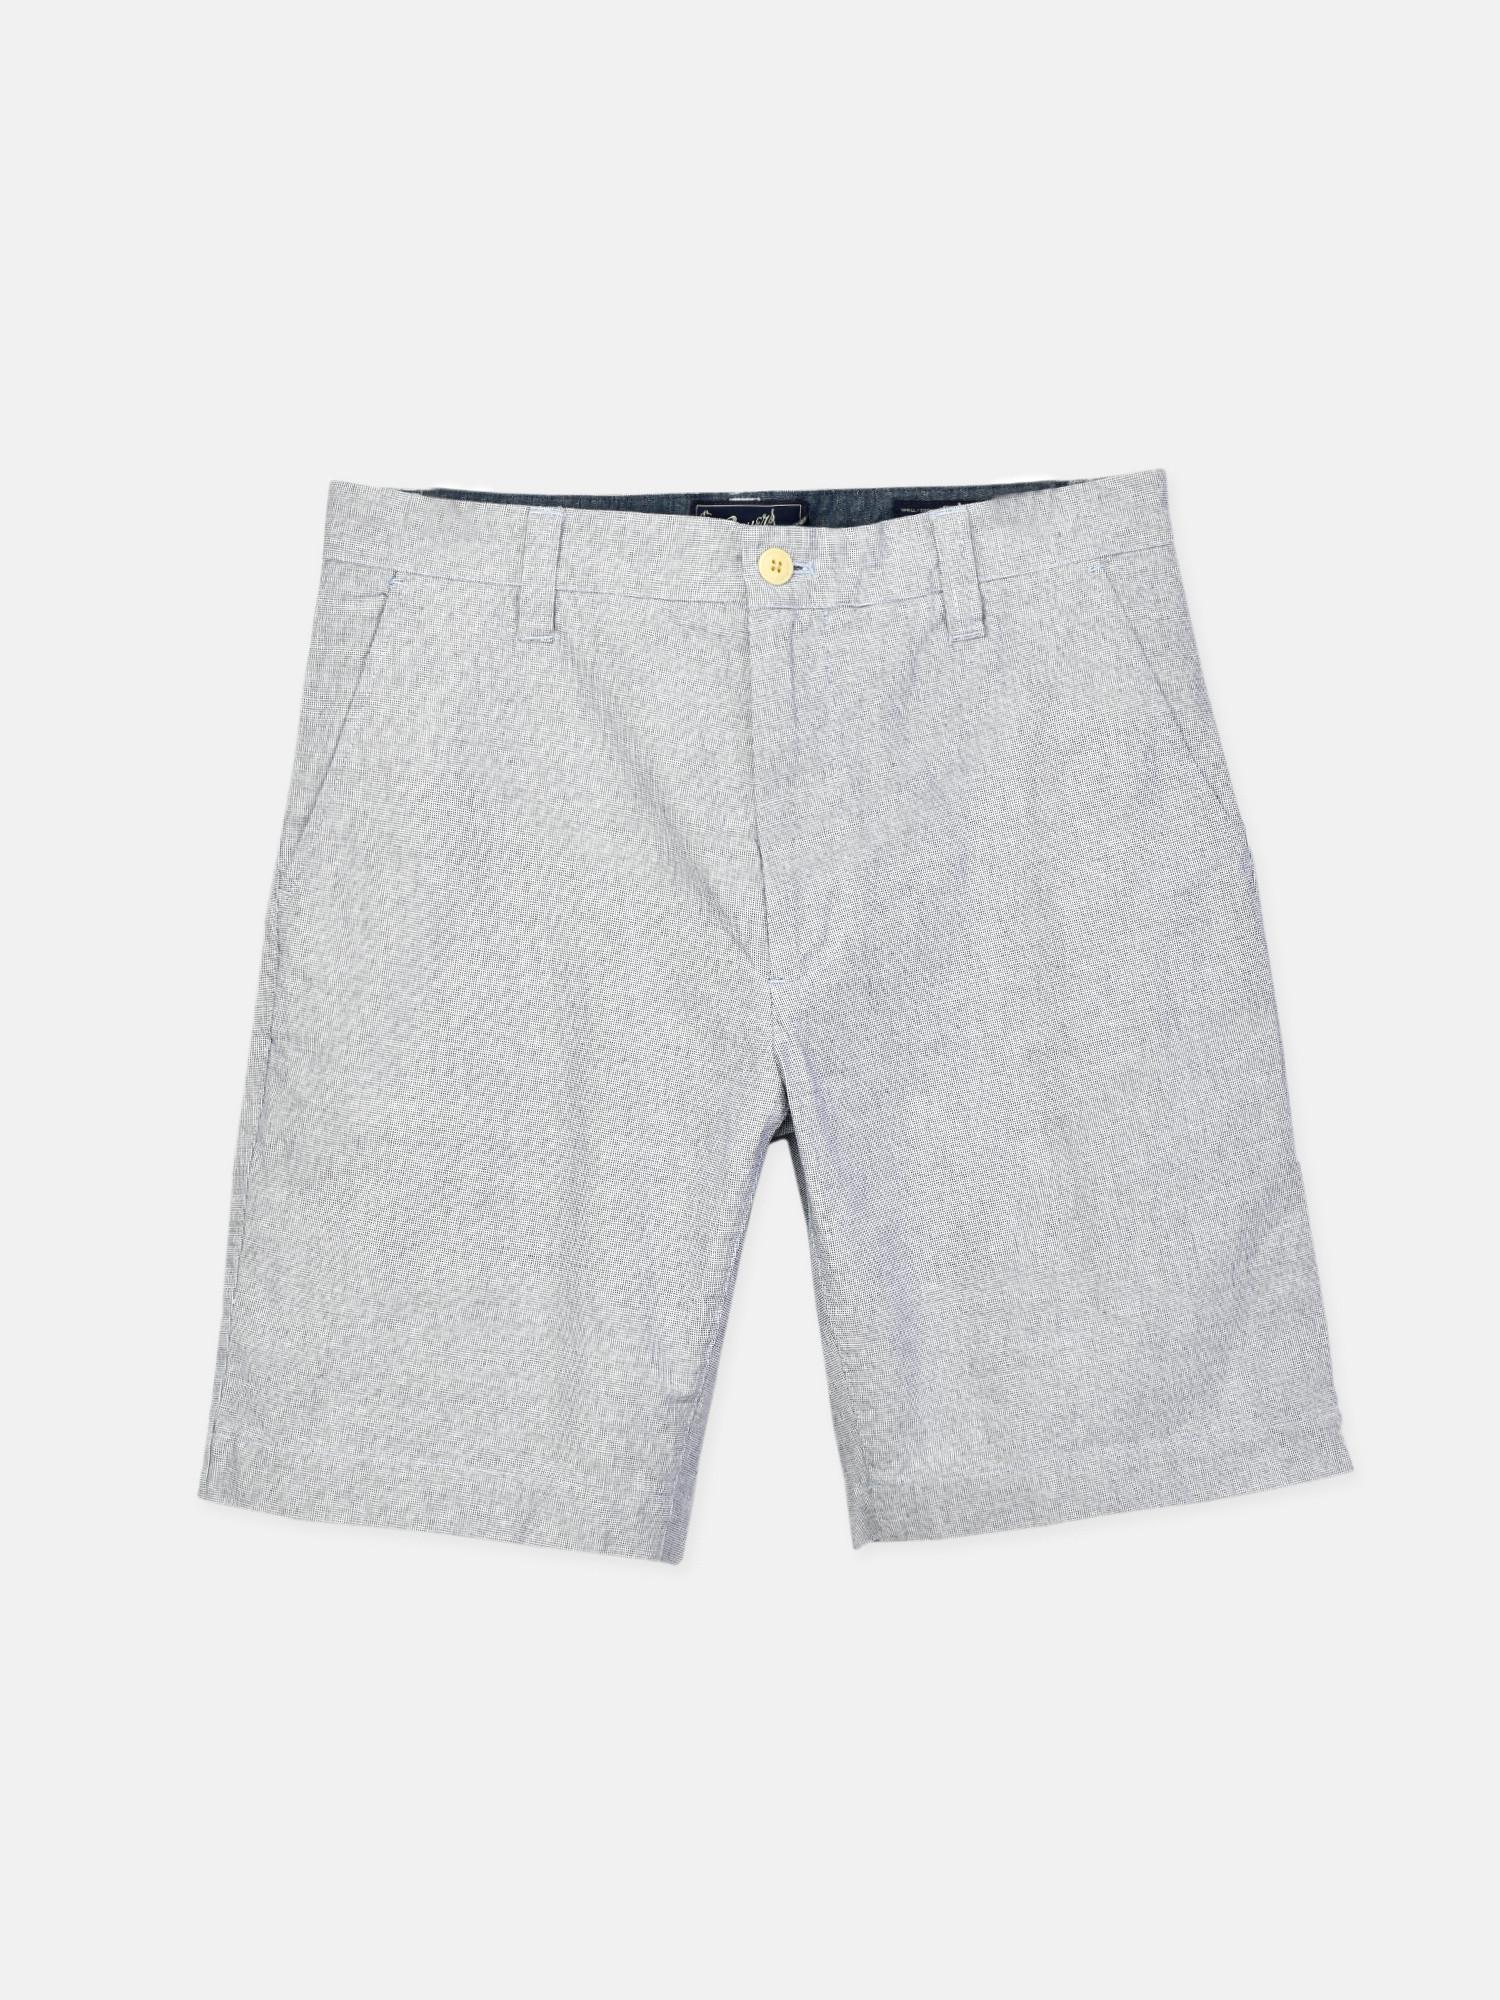 TROUSERS - Bermuda shorts Grayers 2Bbysr6A